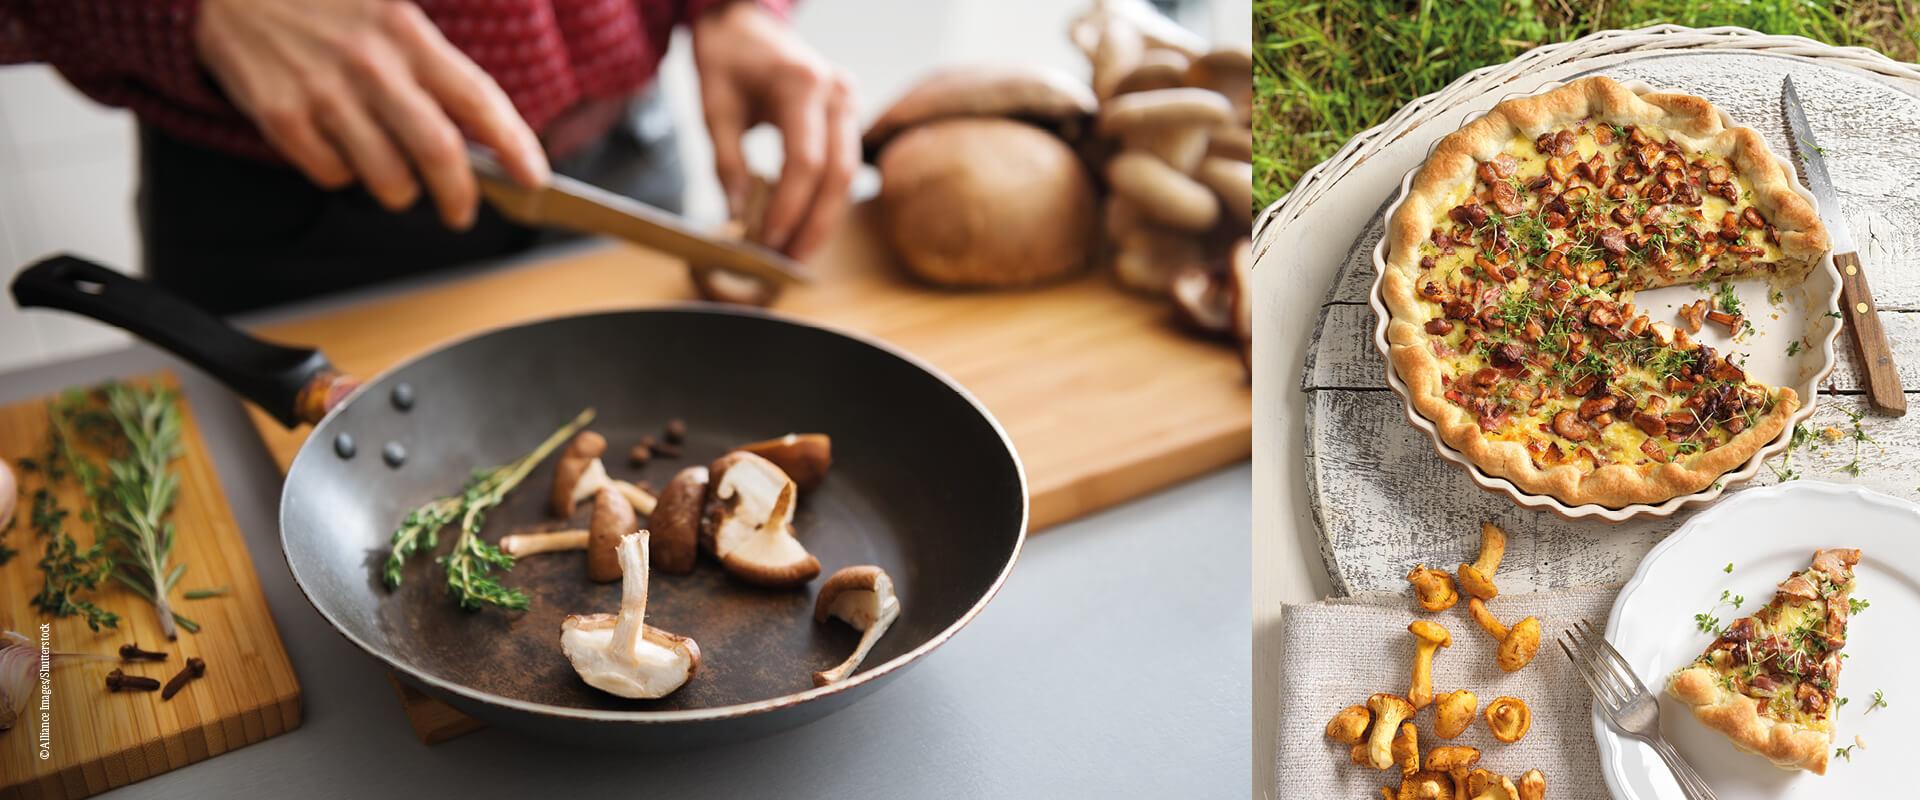 Pilze_Wissenswertes_zubereiten